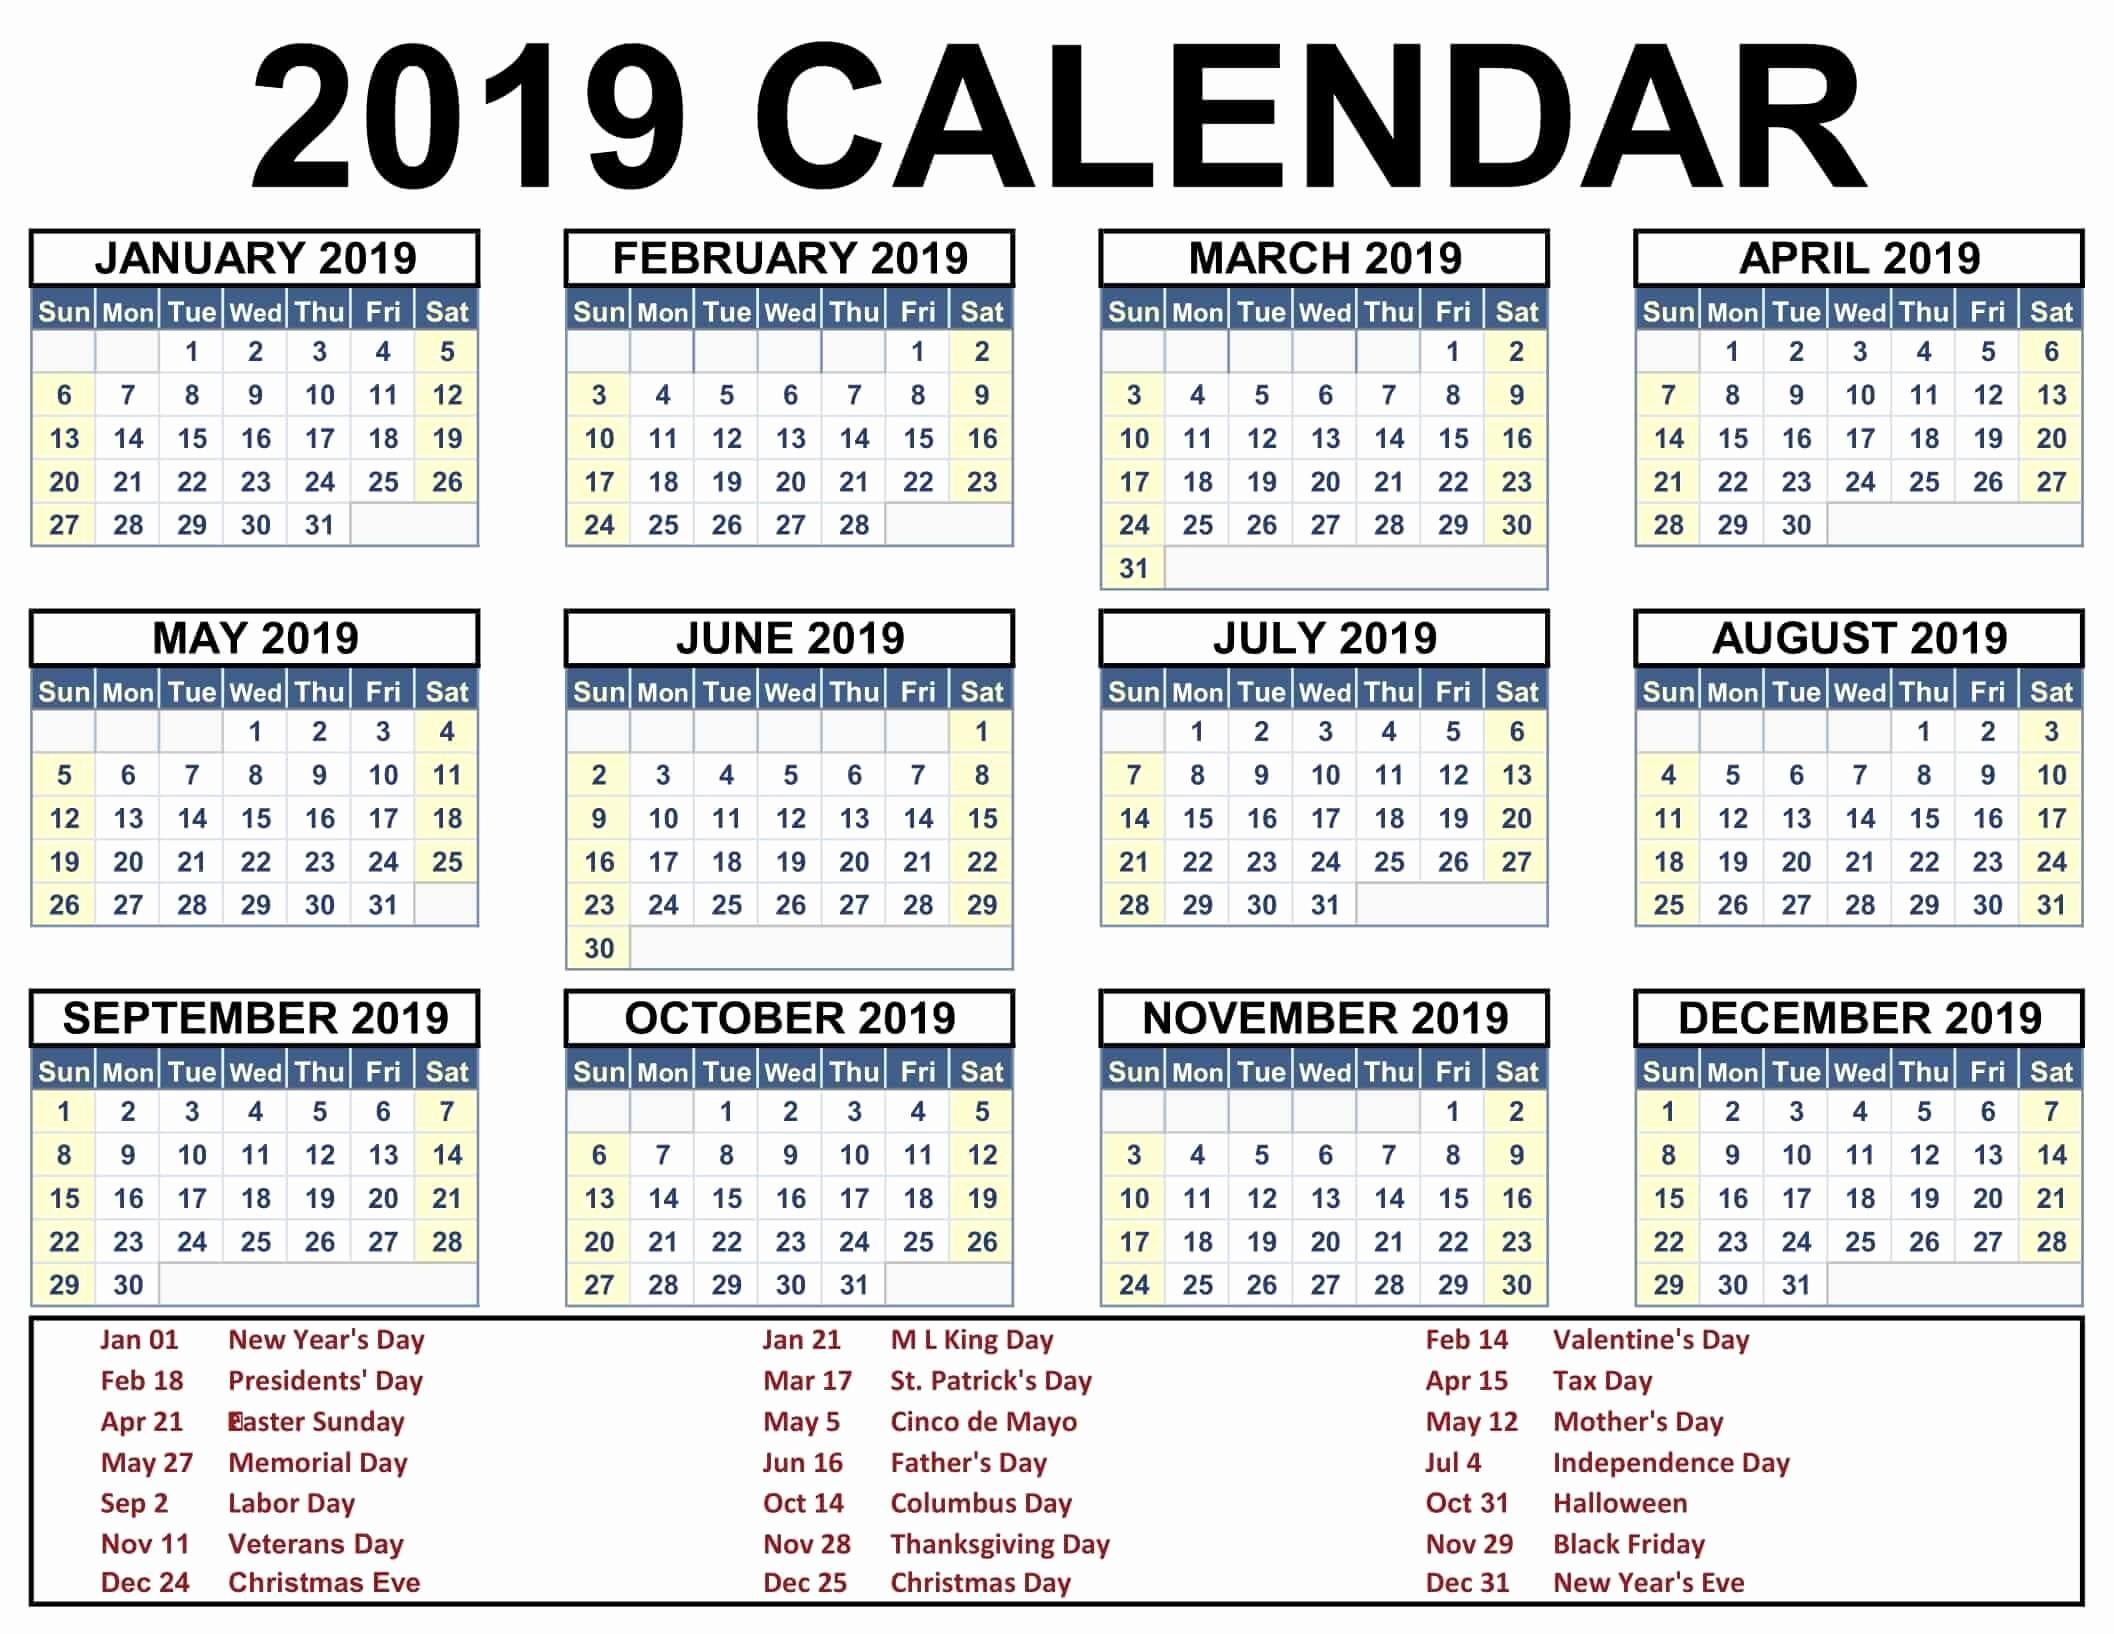 Luxury 32 Examples Hanukkah 2019 2020 Calendar | Etxettipia-Calendar Of Jewish Holidays 2020